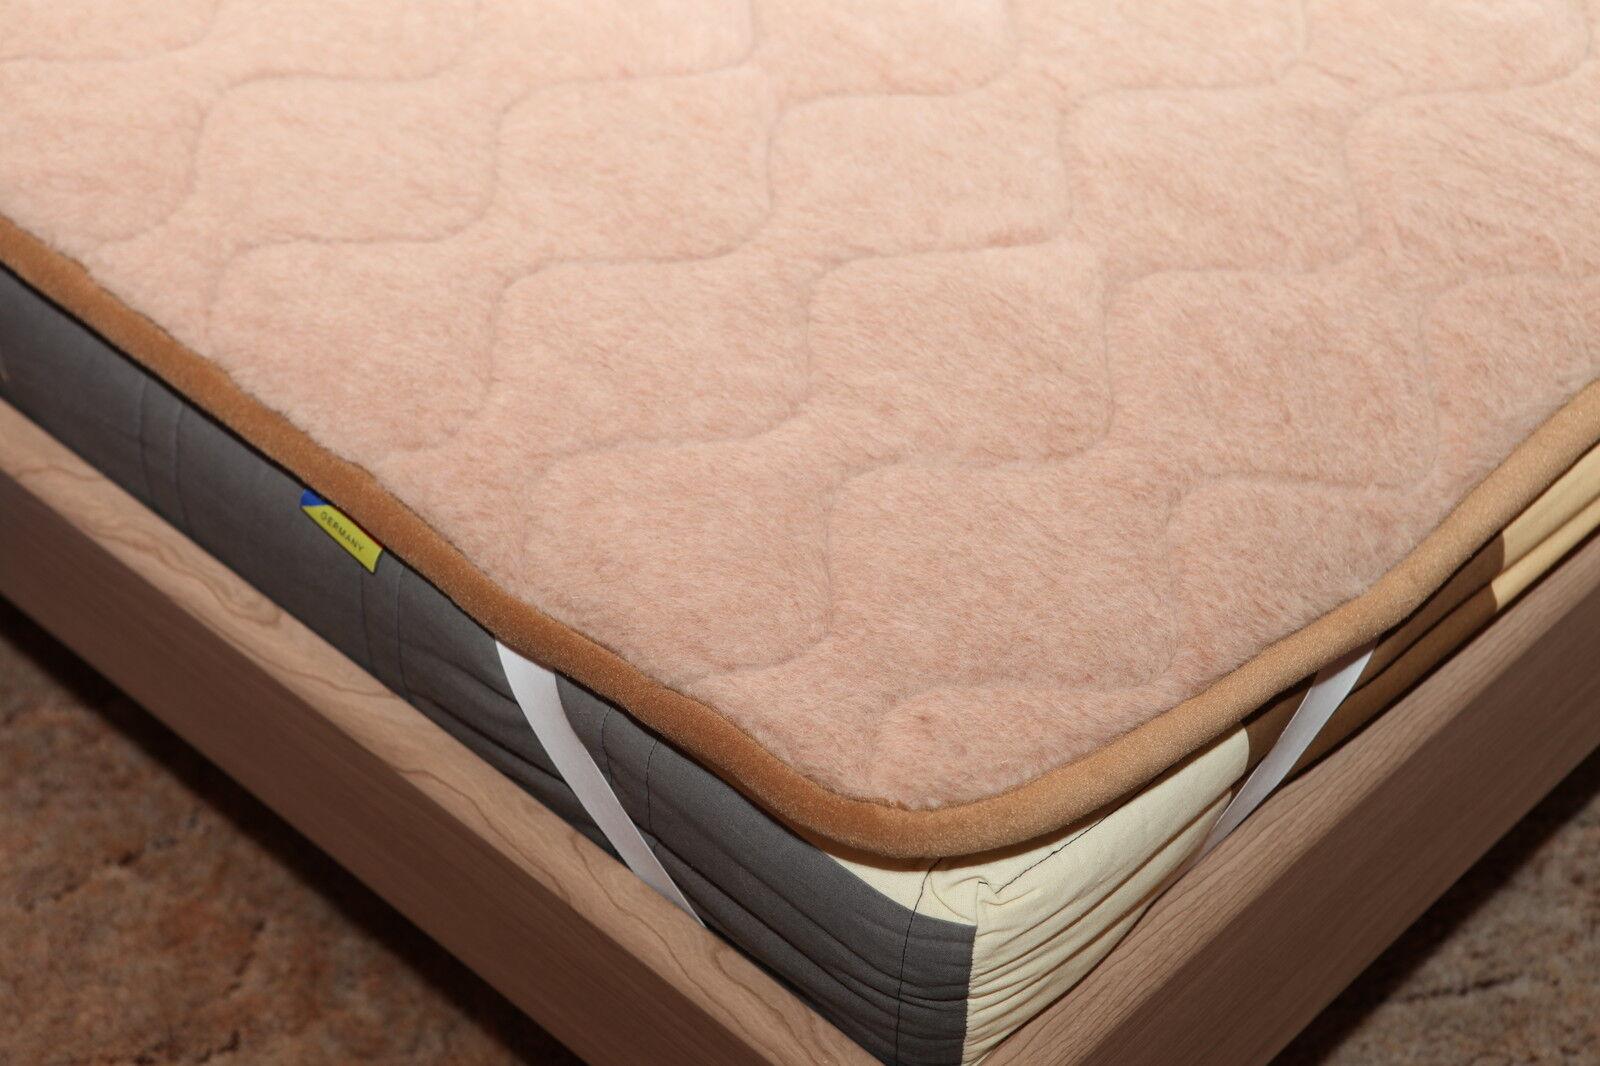 Unterbett Lama Alpaka gesteppt Matratzenauflage Bettauflage 530 g m² 160x200